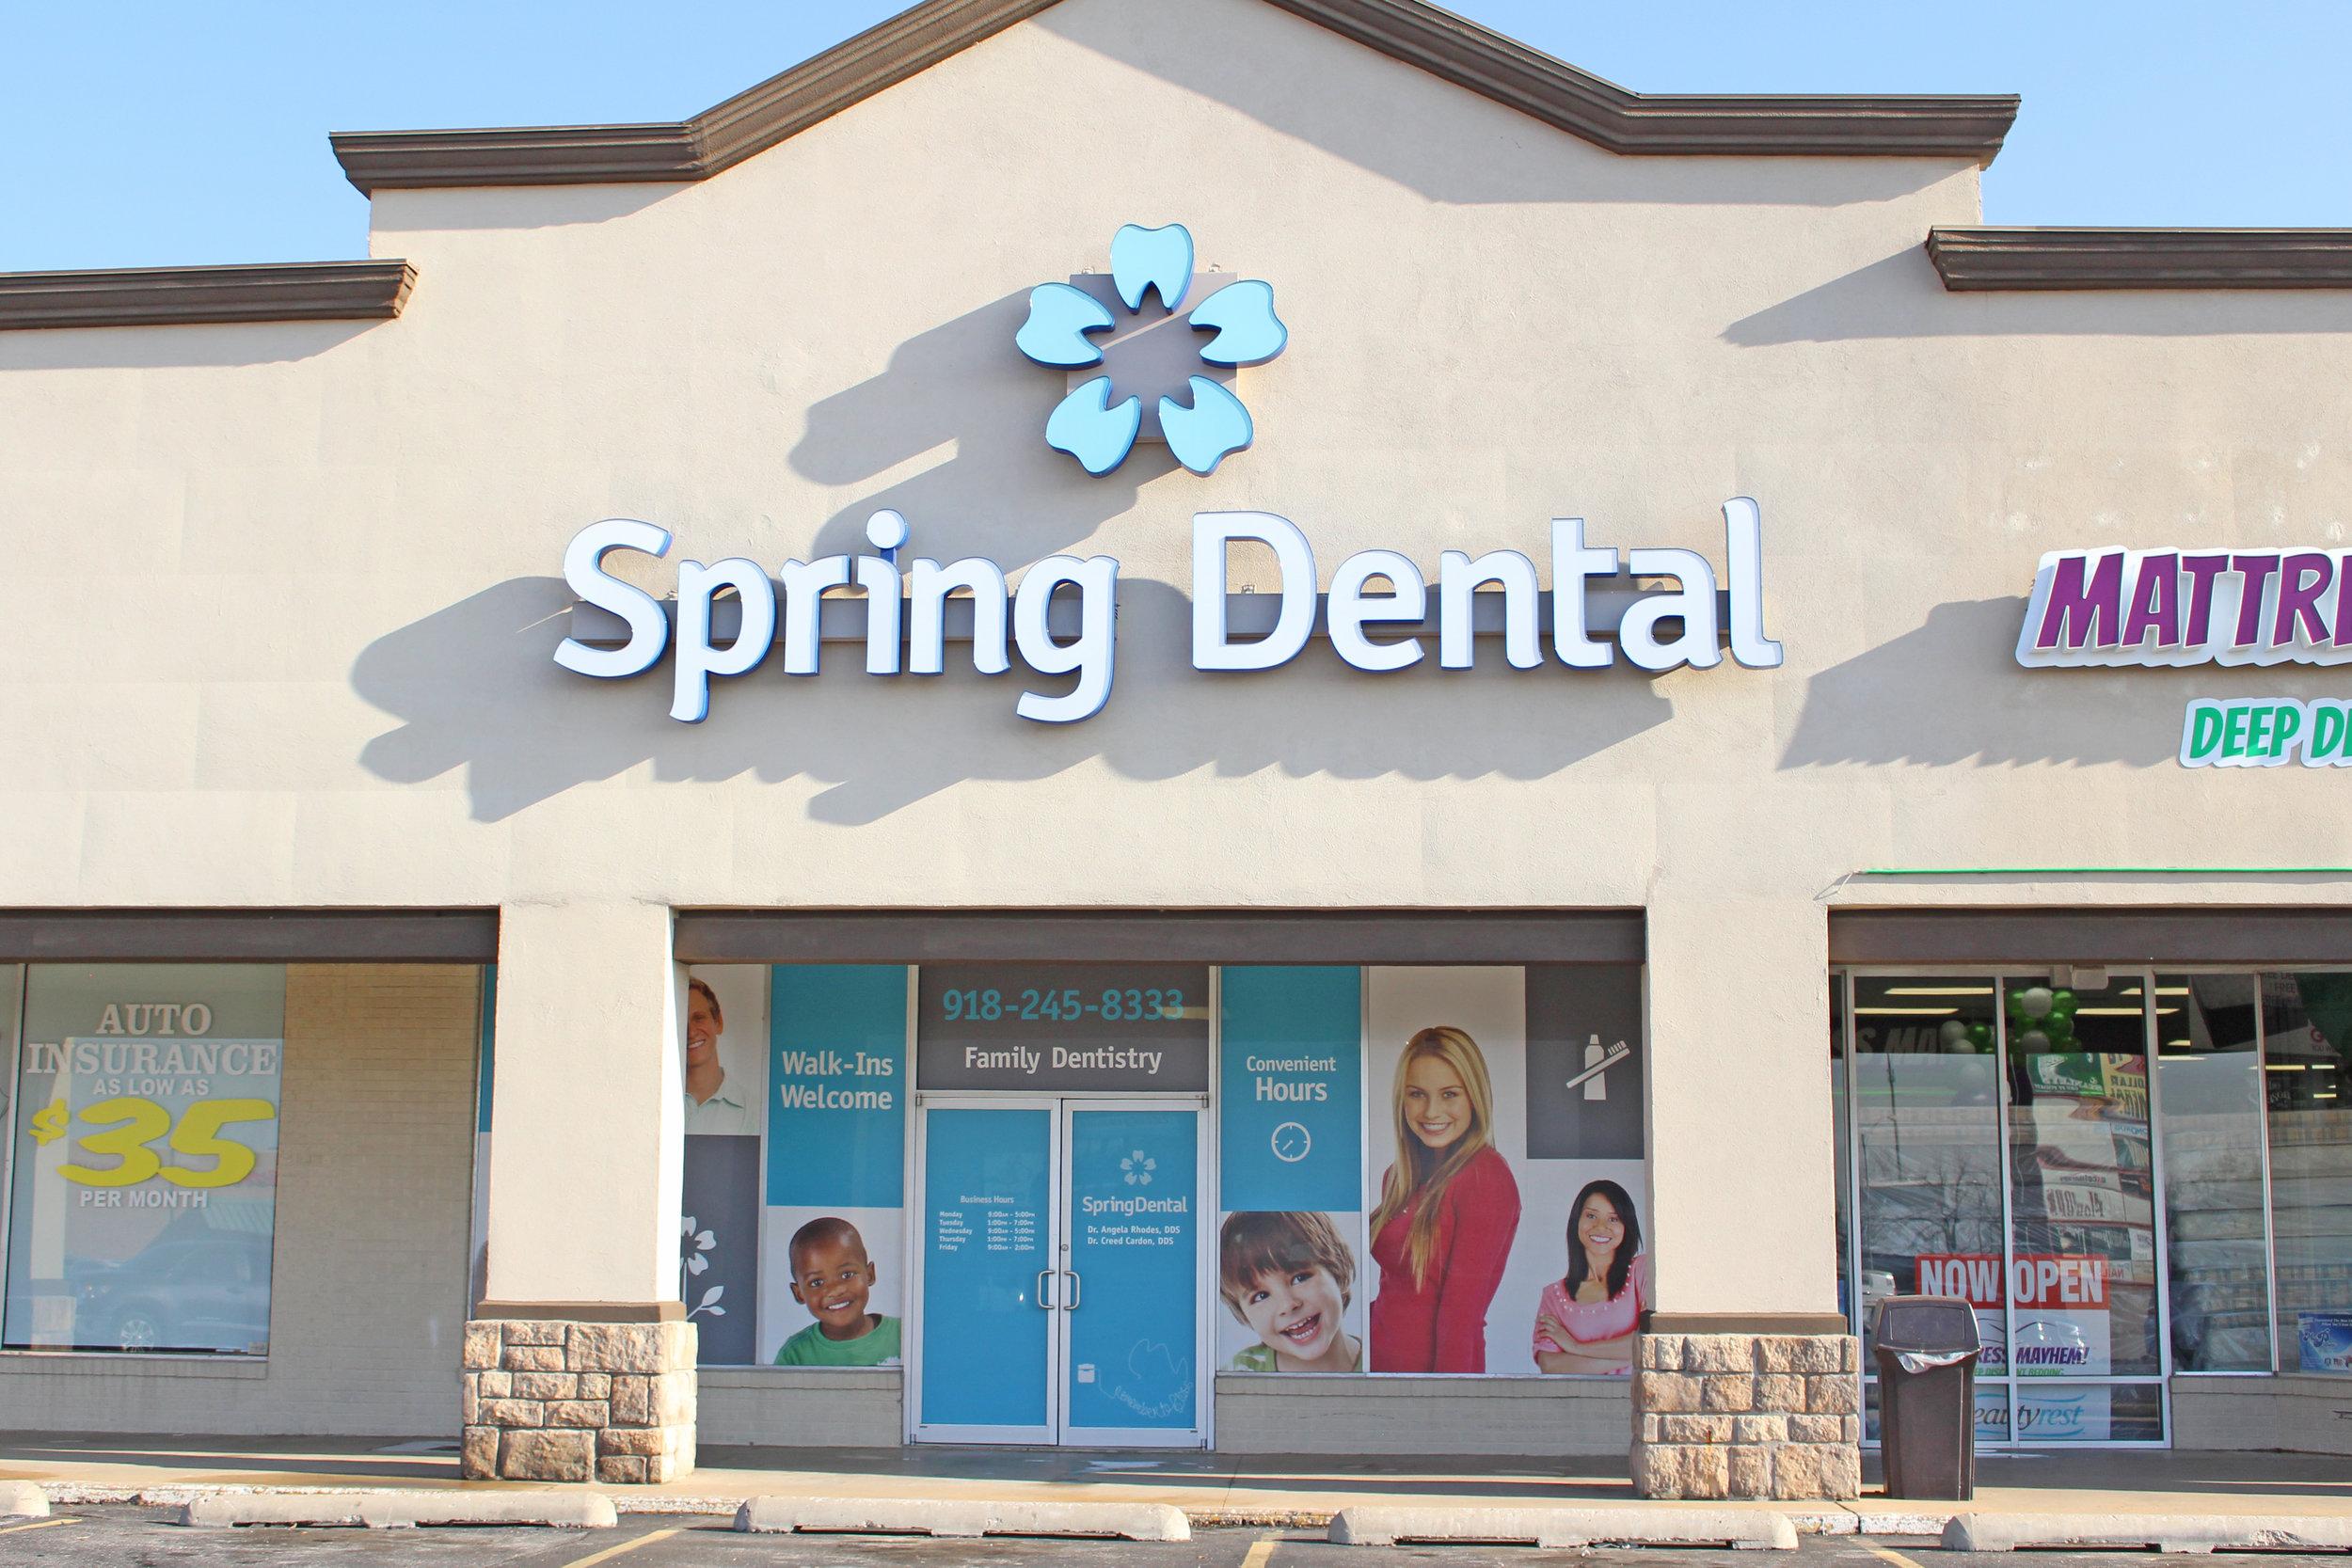 spring dental -shops at adams road 530 plaza court